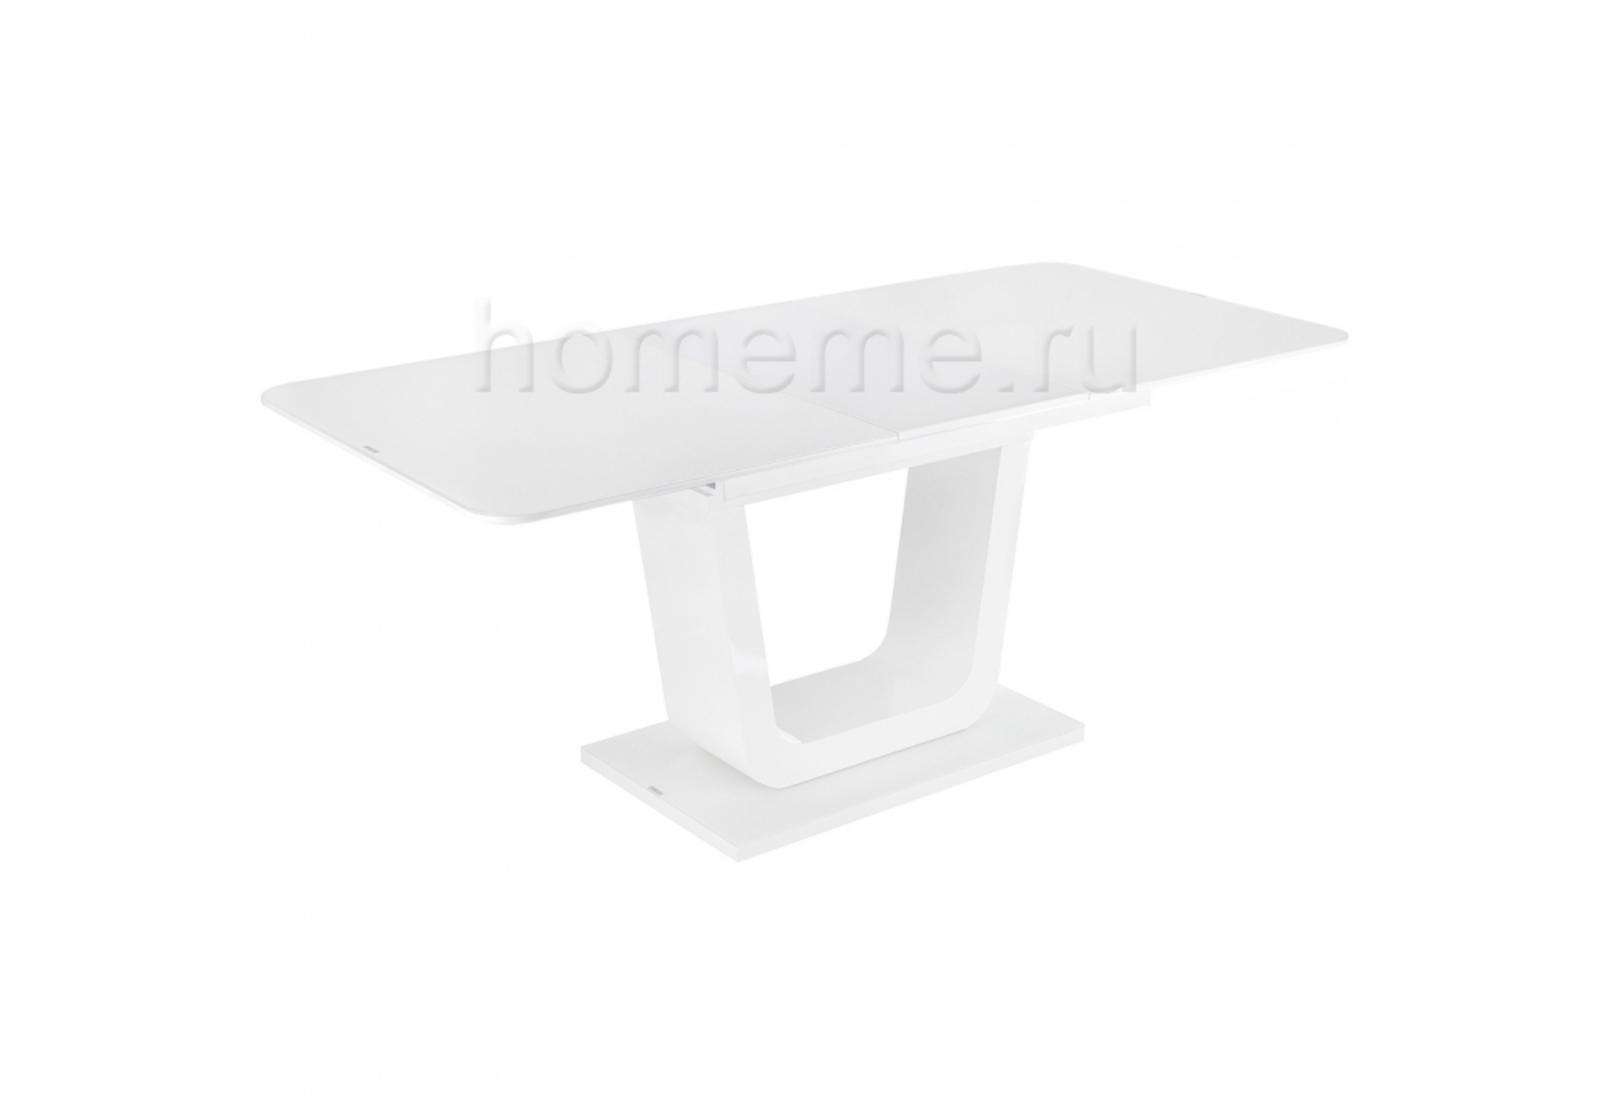 Стол стеклянный Vlinder 140 super white 11187 Vlinder 140 super white 11187 (14416)